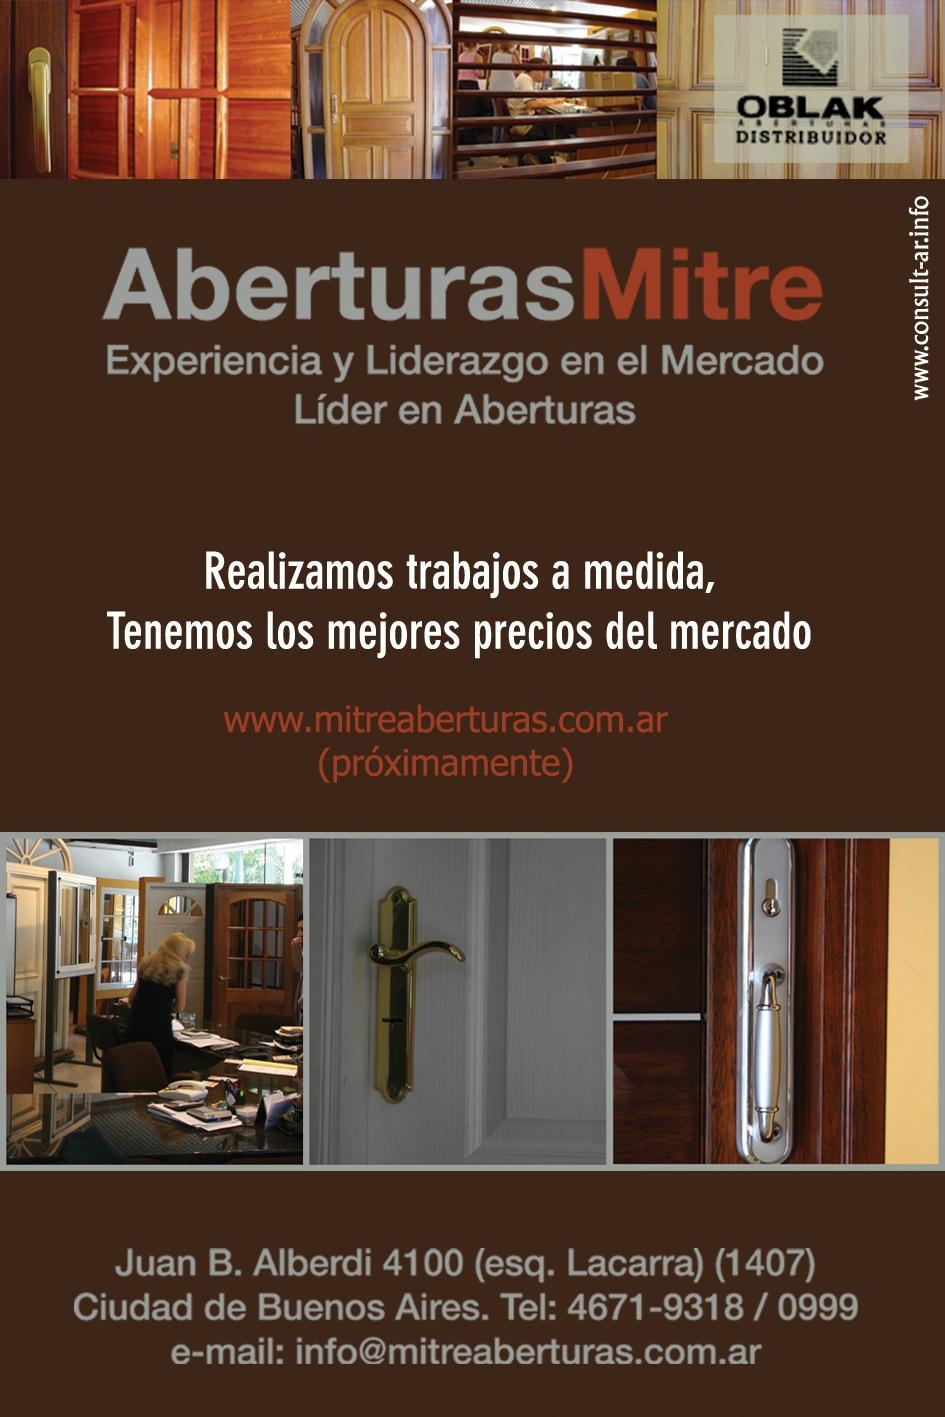 mitre_r1_c3_s1